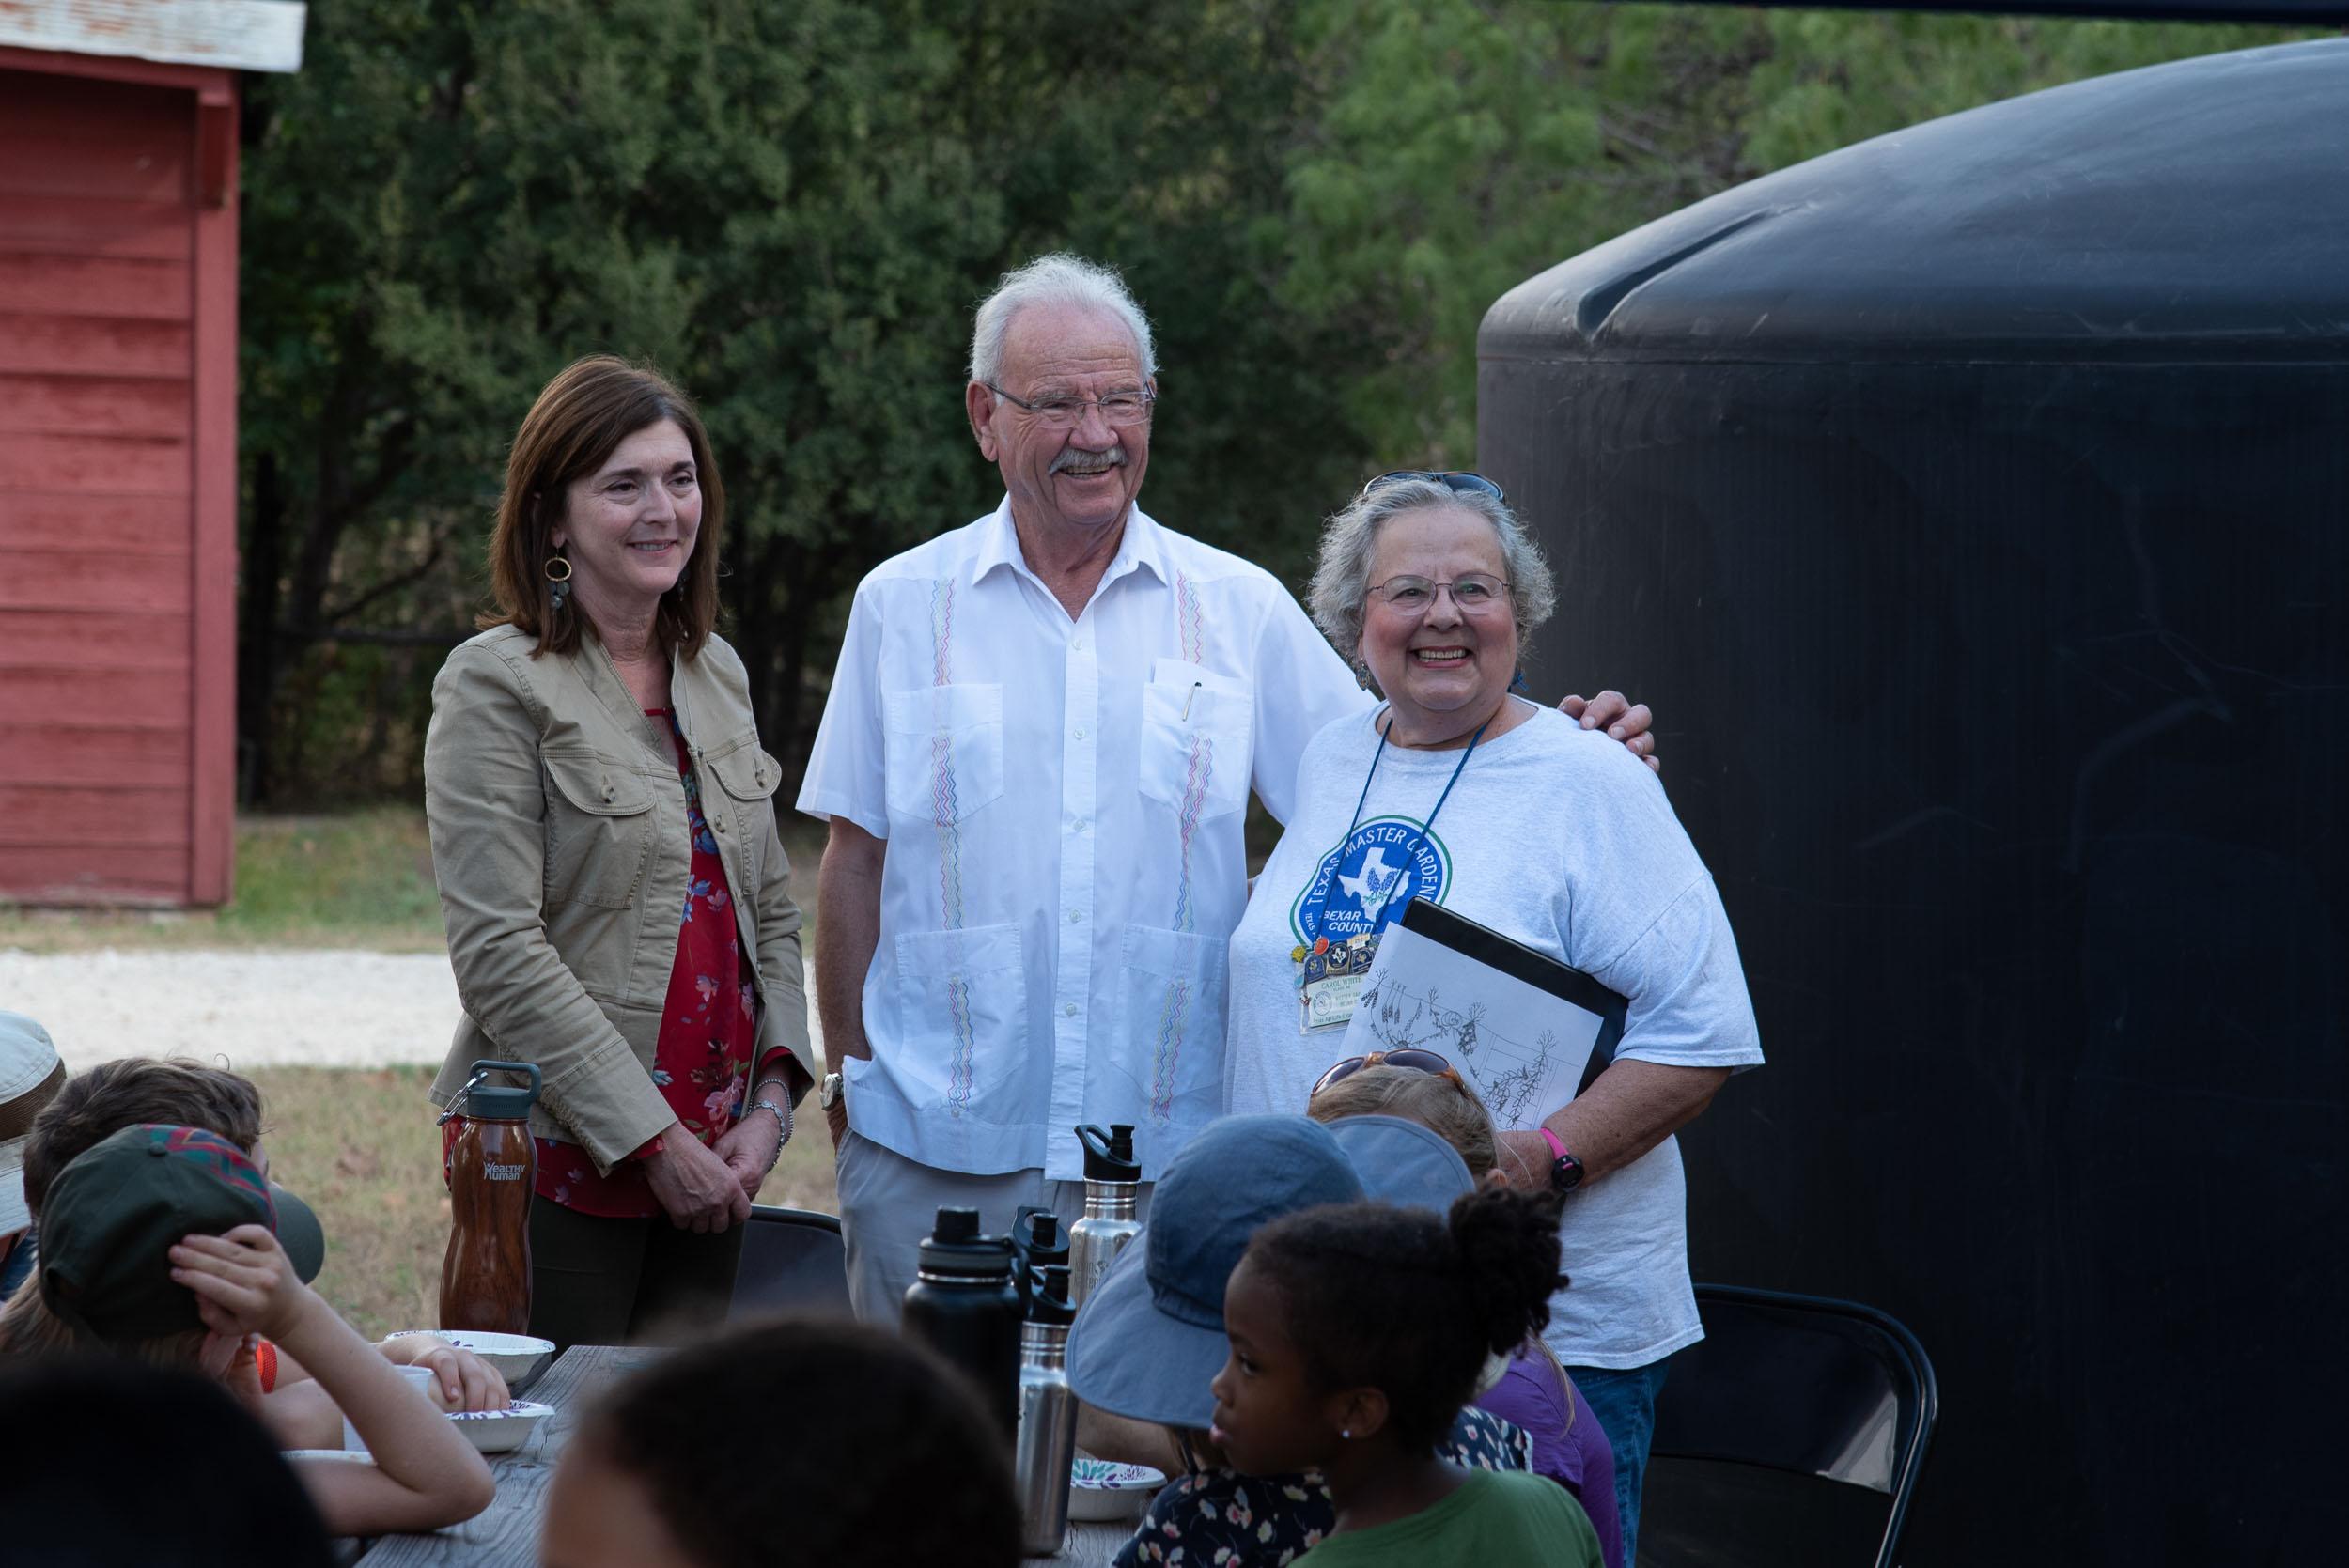 From left, Denise Gross (Executive Director of the Phil Hardberger Park Conservancy), Phil Hardberger (Former San Antonio Mayor and park namesake), and Carol White (Bexar County Master Gardener).